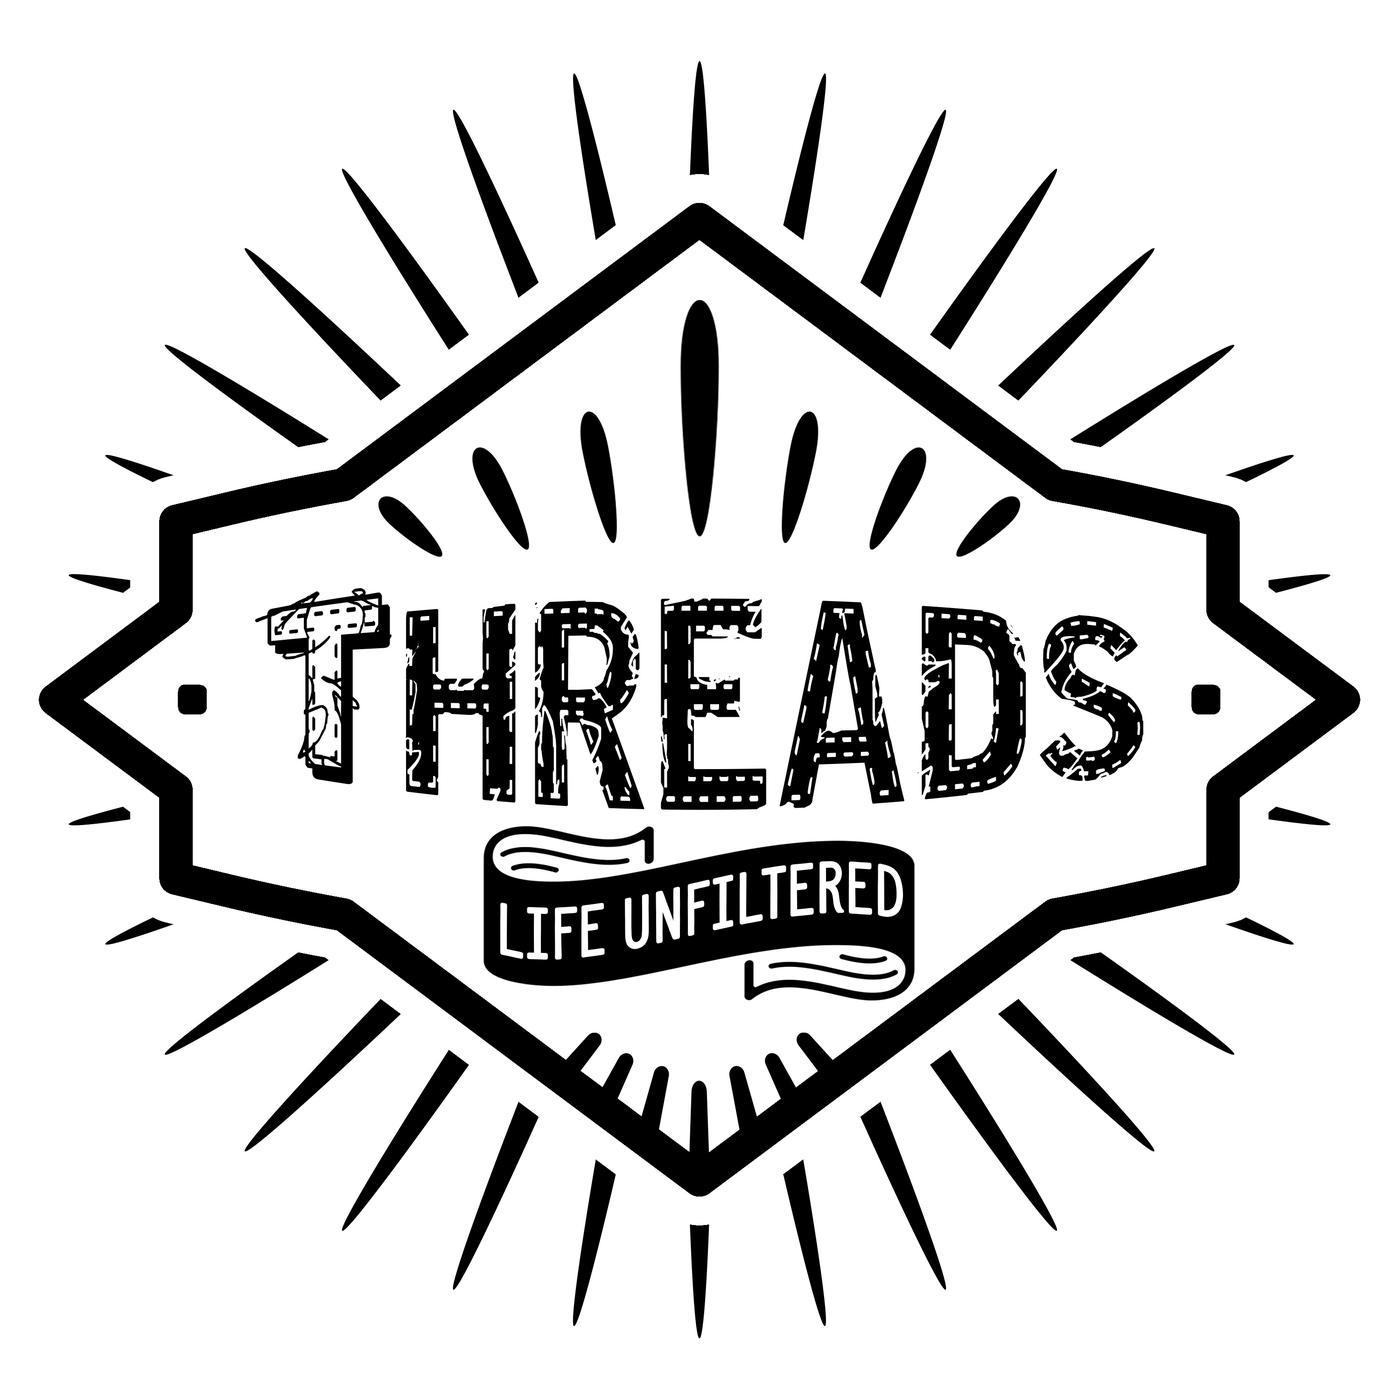 Threads Podcast: Life Unfiltered - Ben Kraker & Jason Tieri